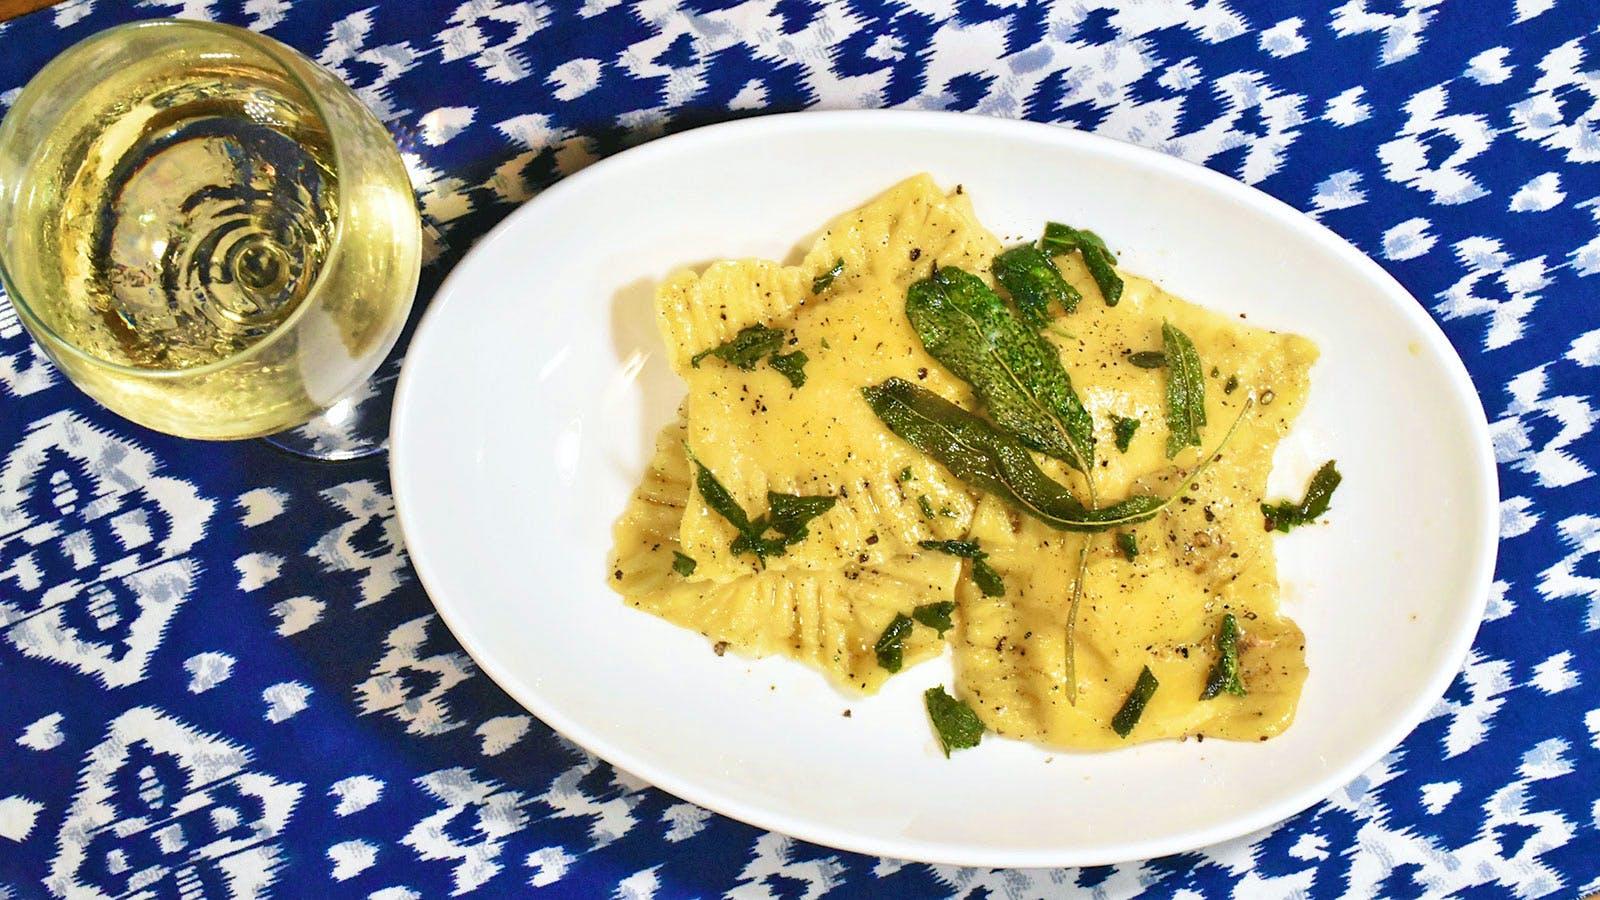 8 & $20: Butternut Squash Ravioli in Brown Butter with Crispy Sage